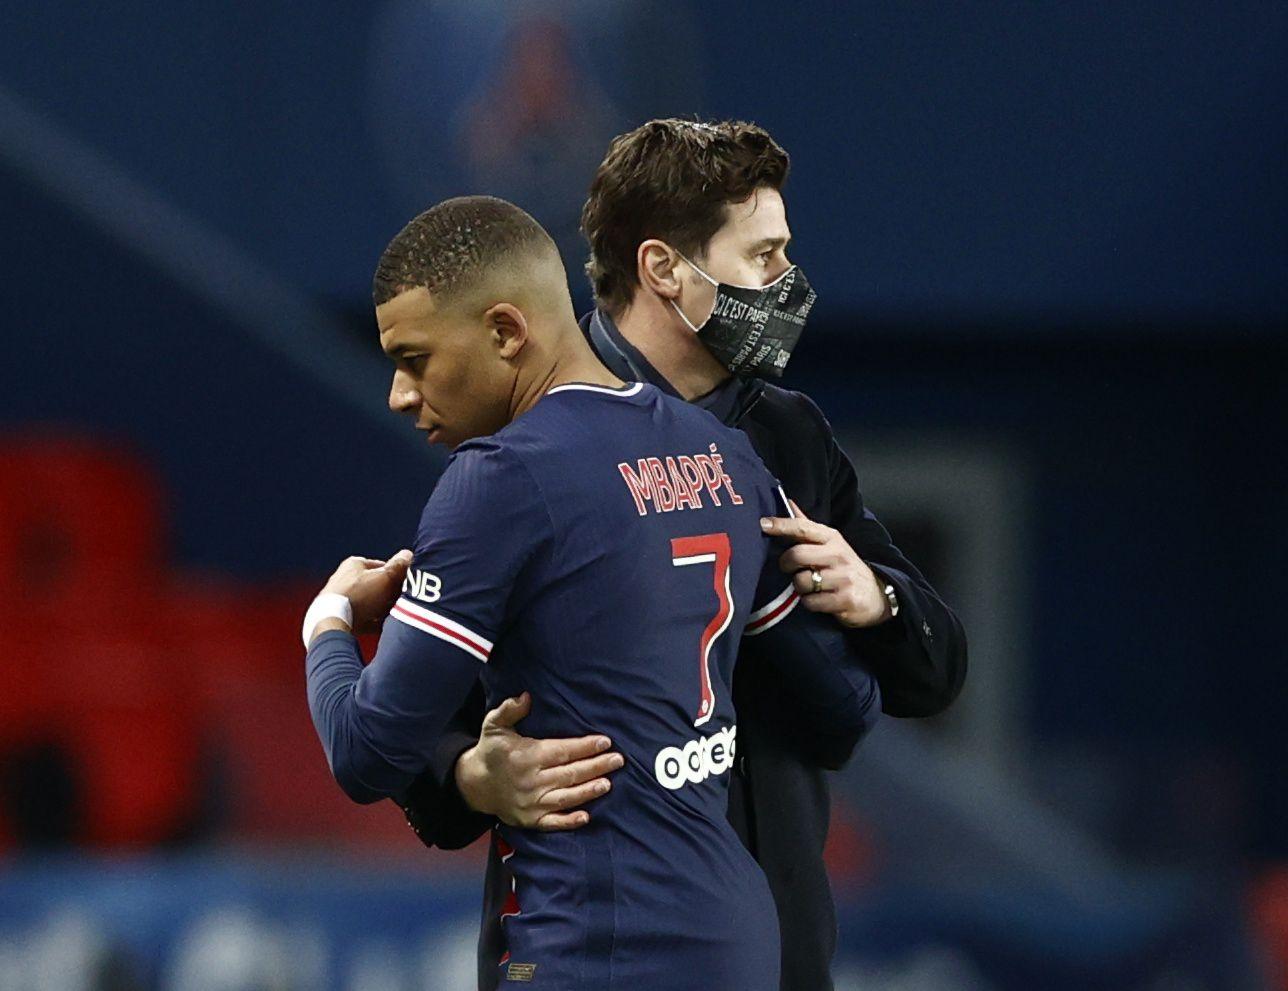 Mauricio Pochettino aplicó mano dura para controlar a Kylian Mbappe y Neymar (REUTERS/Christian Hartmann)